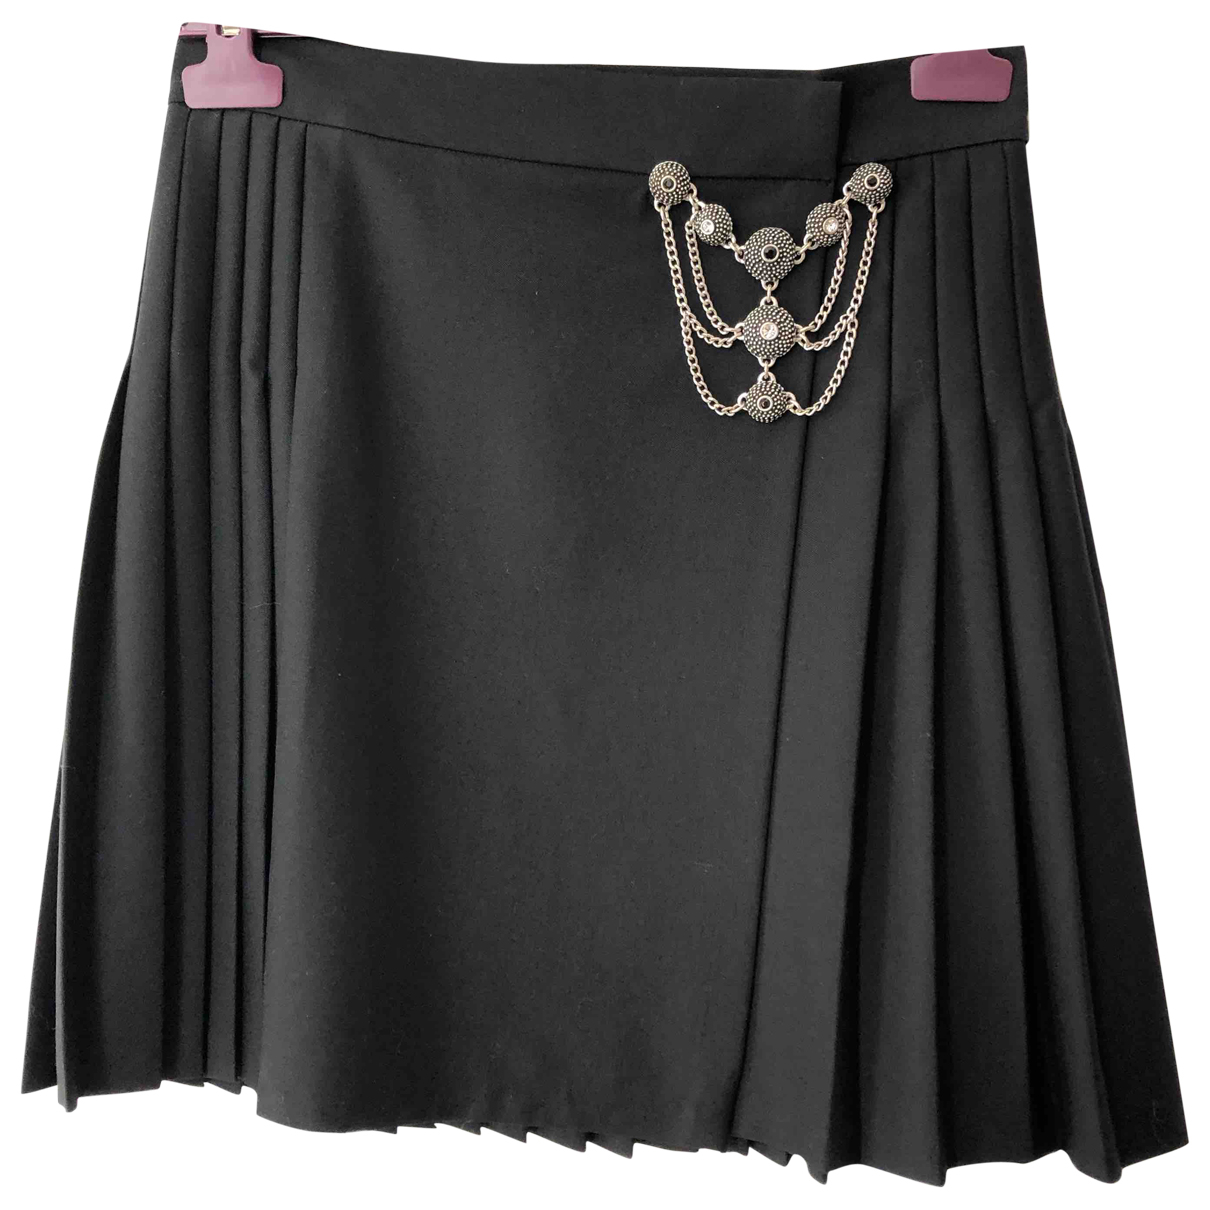 The Kooples \N Black Wool skirt for Women 36 FR